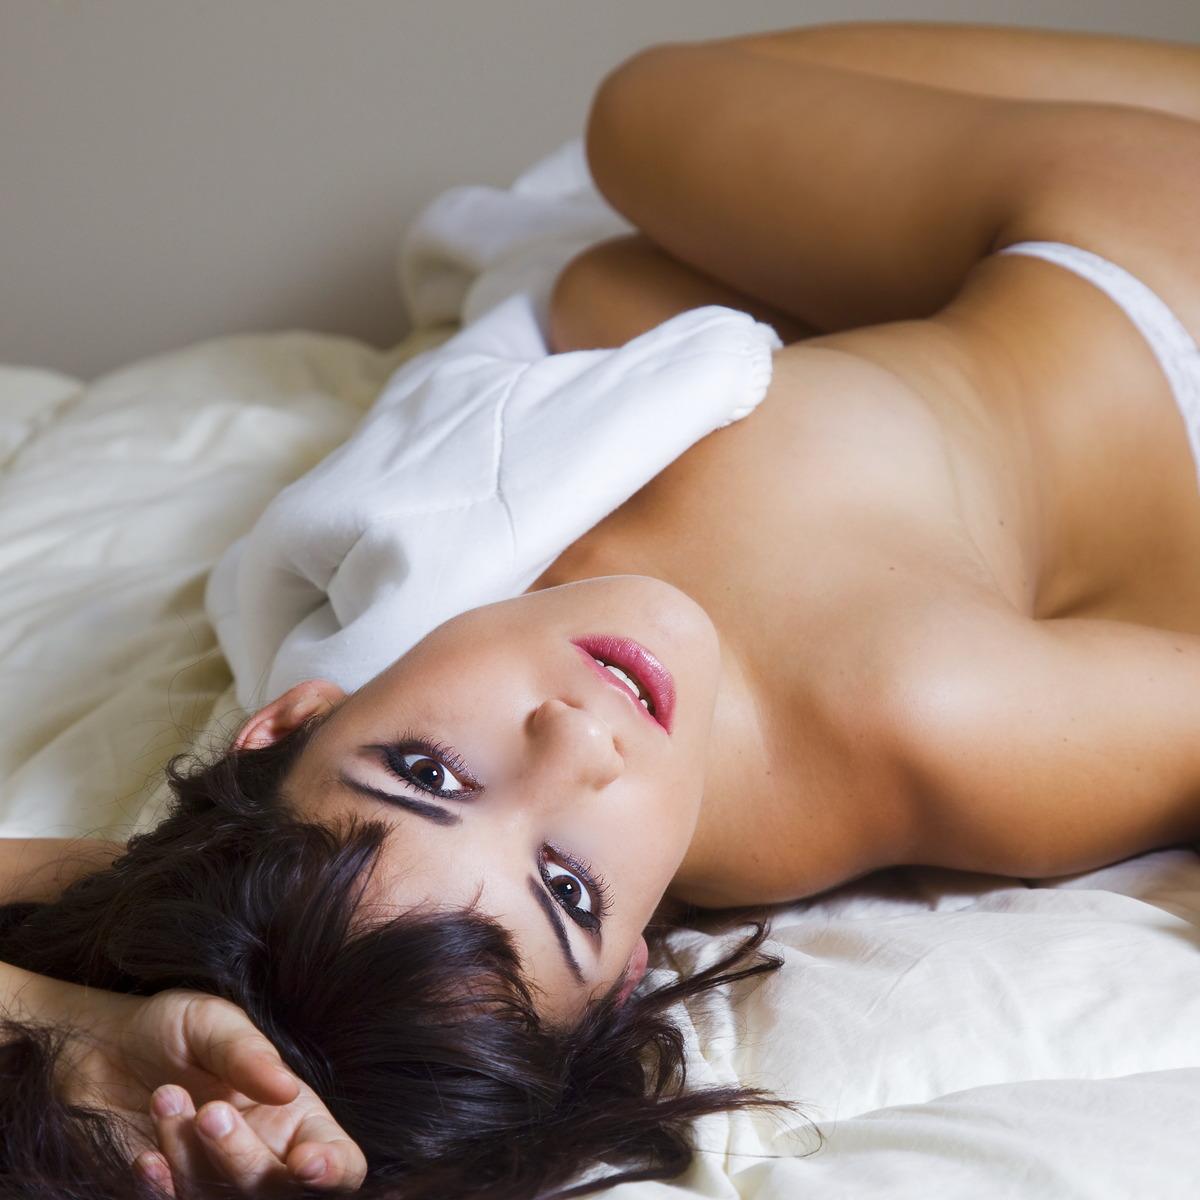 Sexy Girl kuschelt im Bett